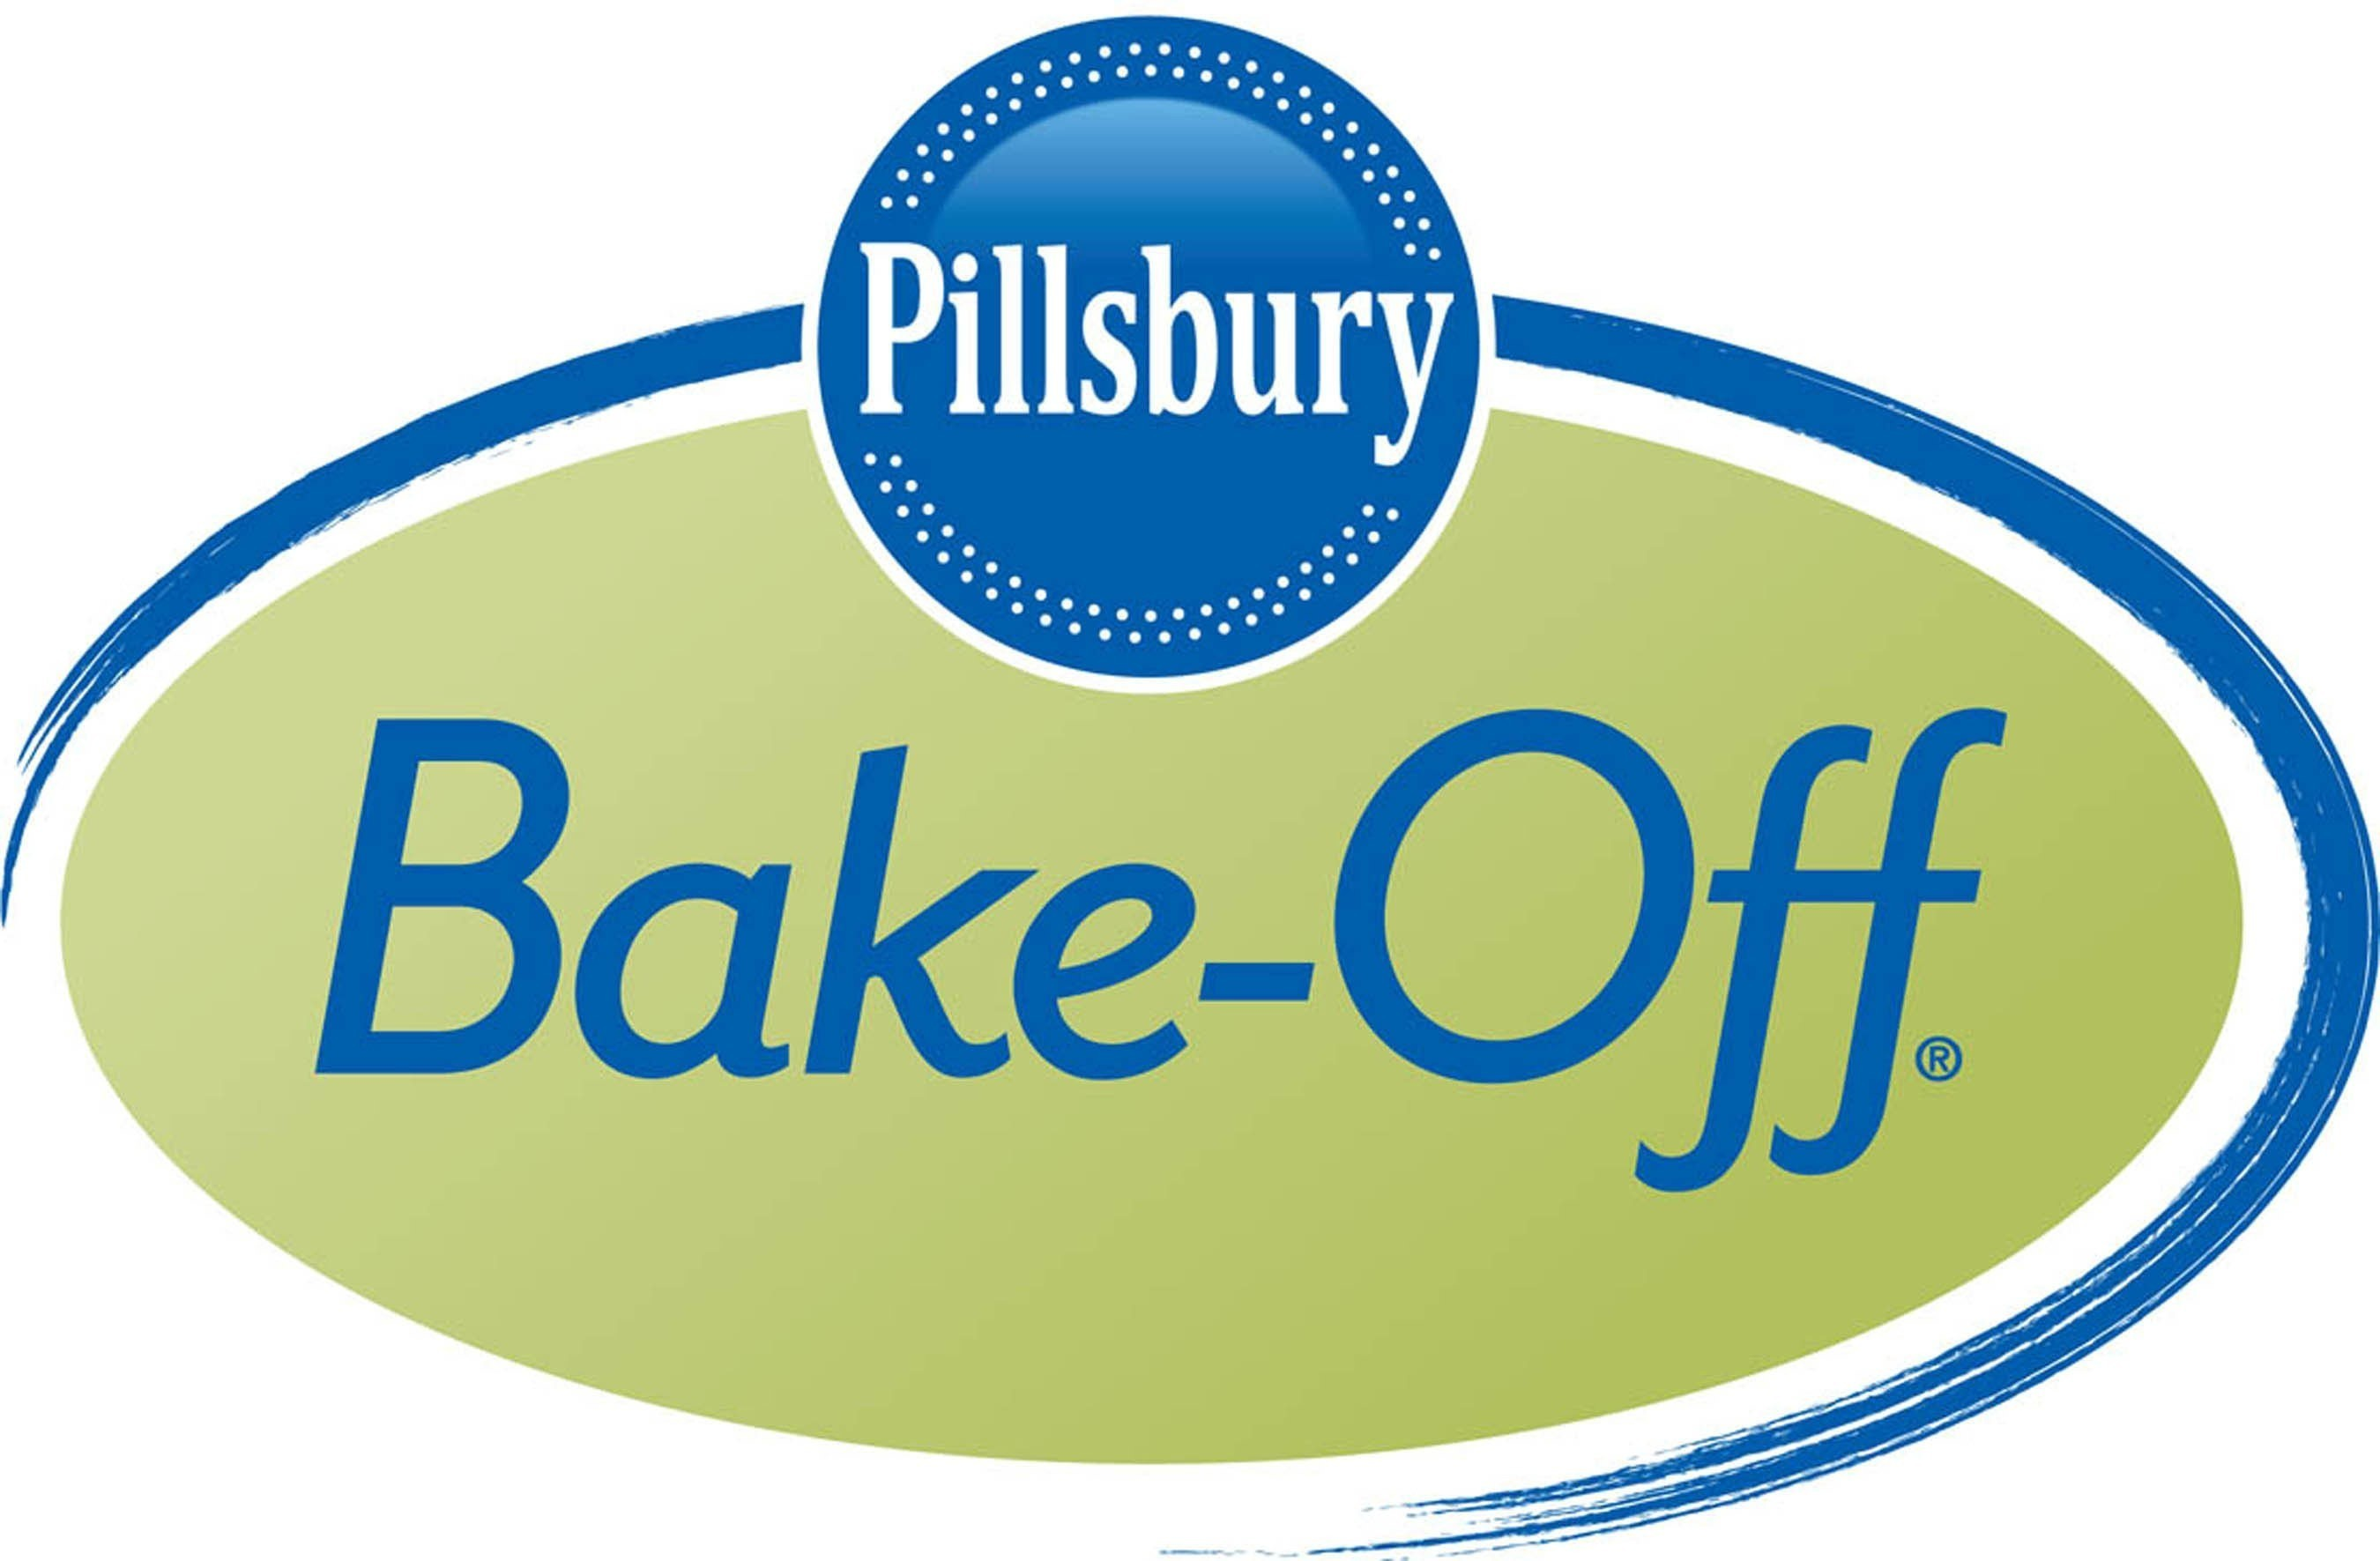 Who will win $1 million? Go to BakeOff.com to learn more! (PRNewsFoto/Pillsbury)